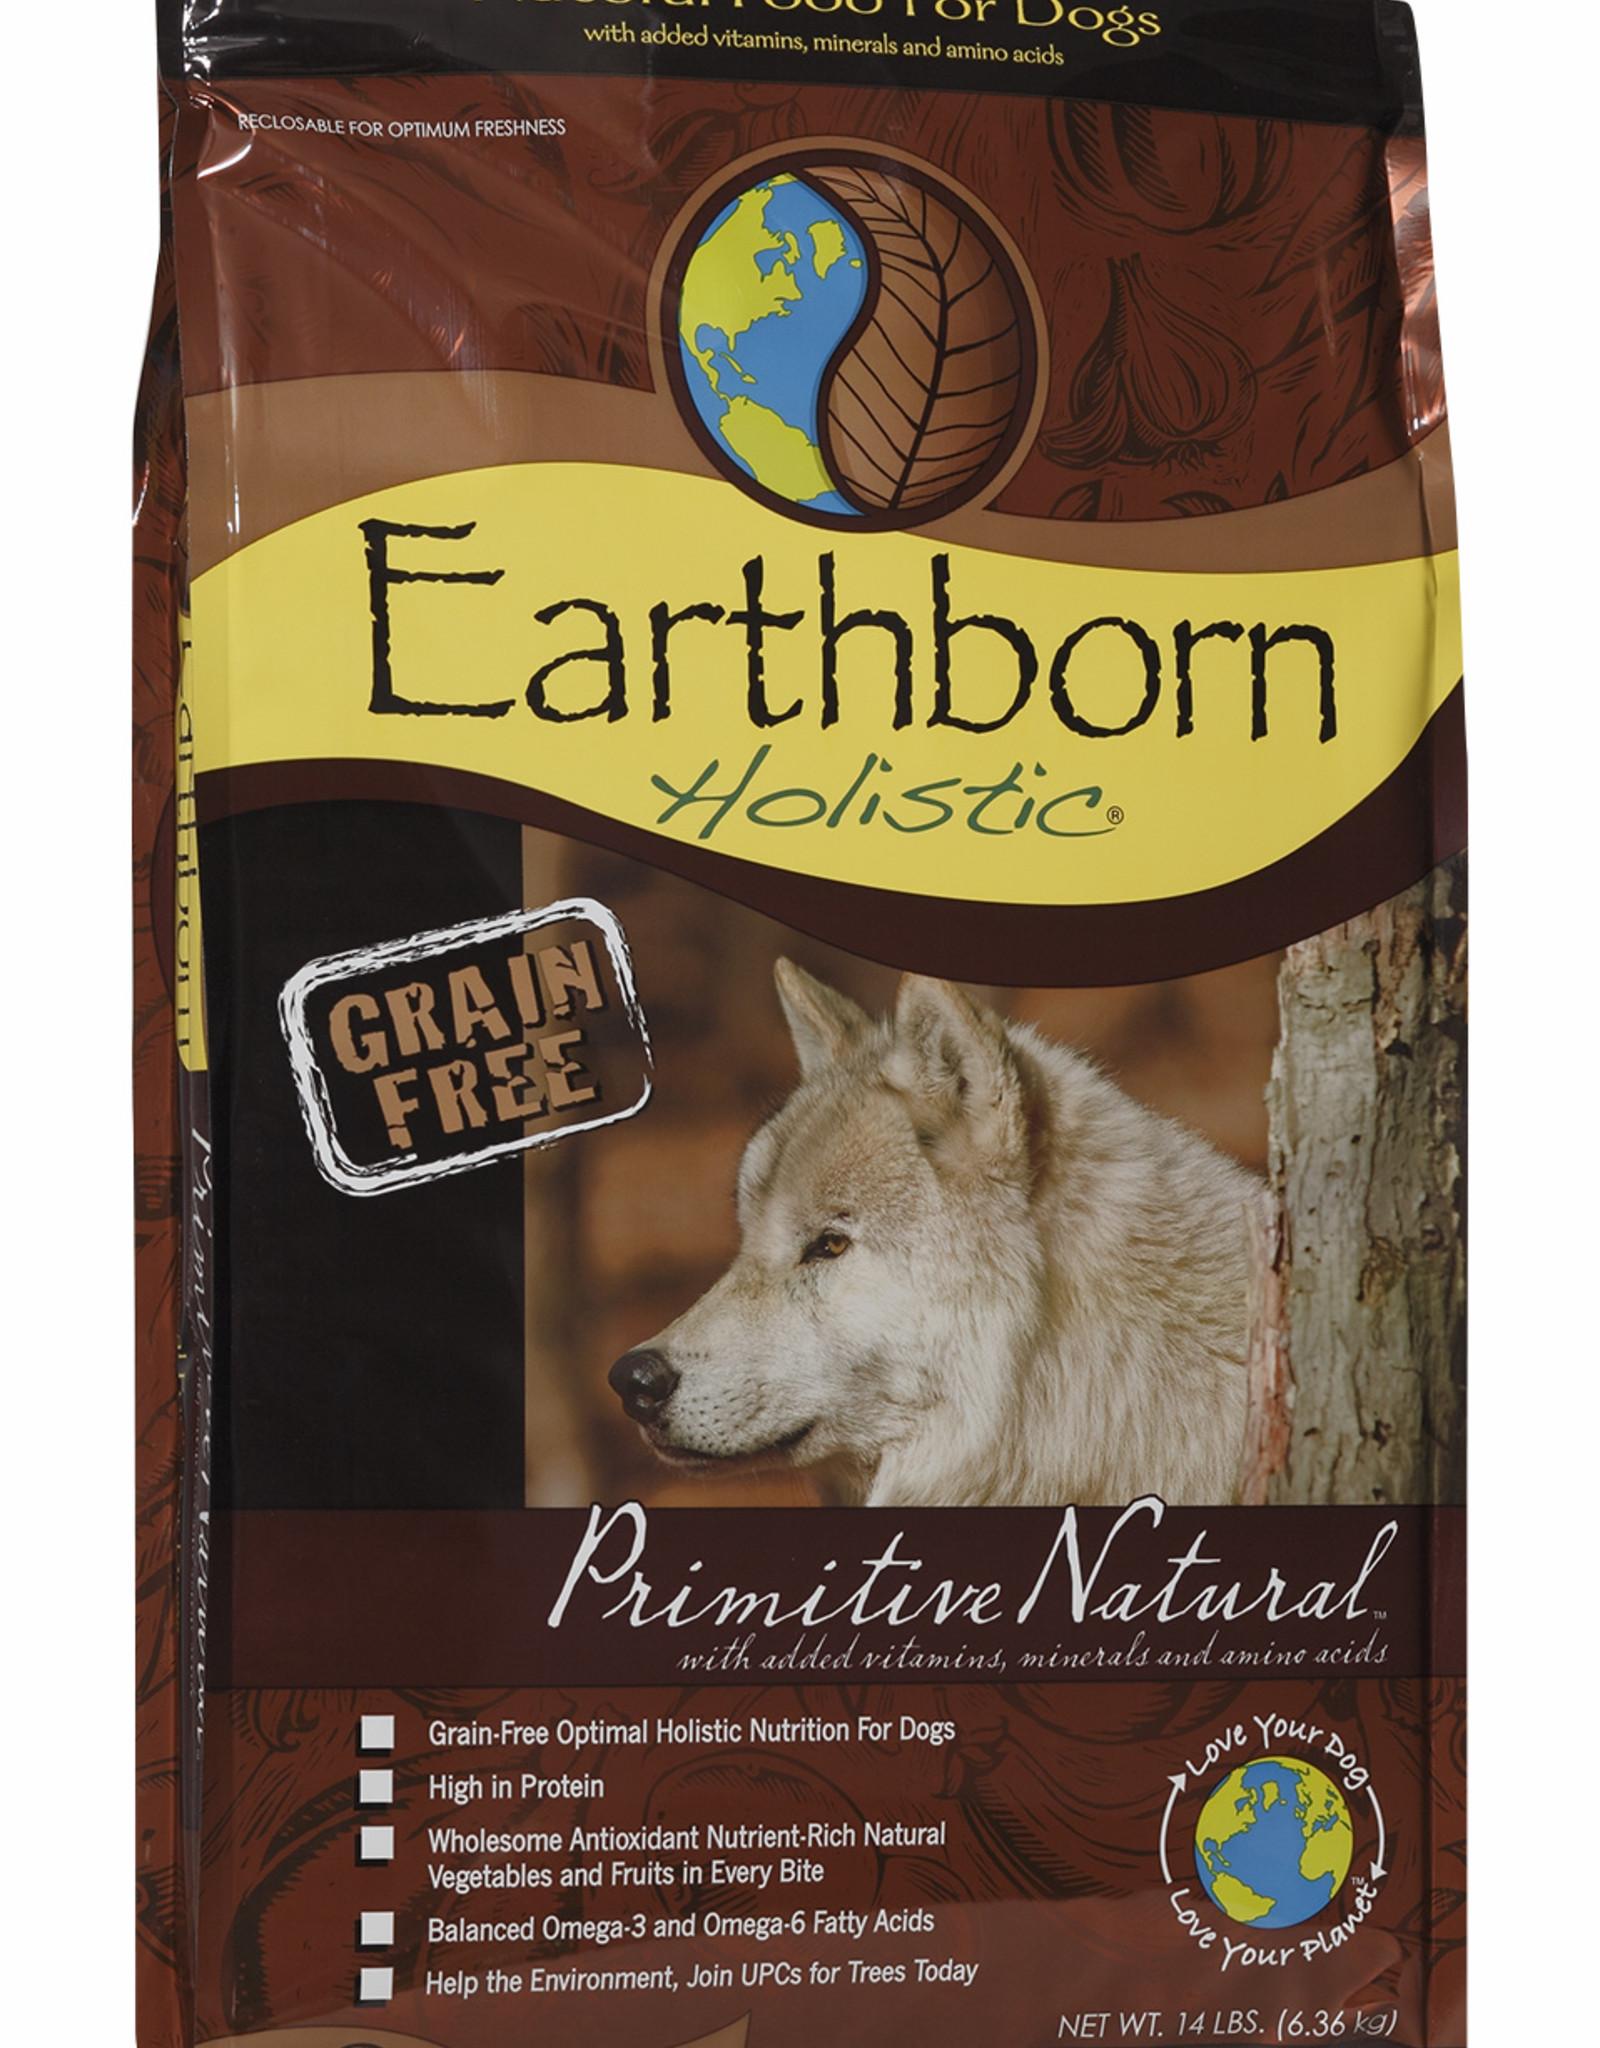 Earthborn Earthborn Holistic Dog Food Primitve Natural